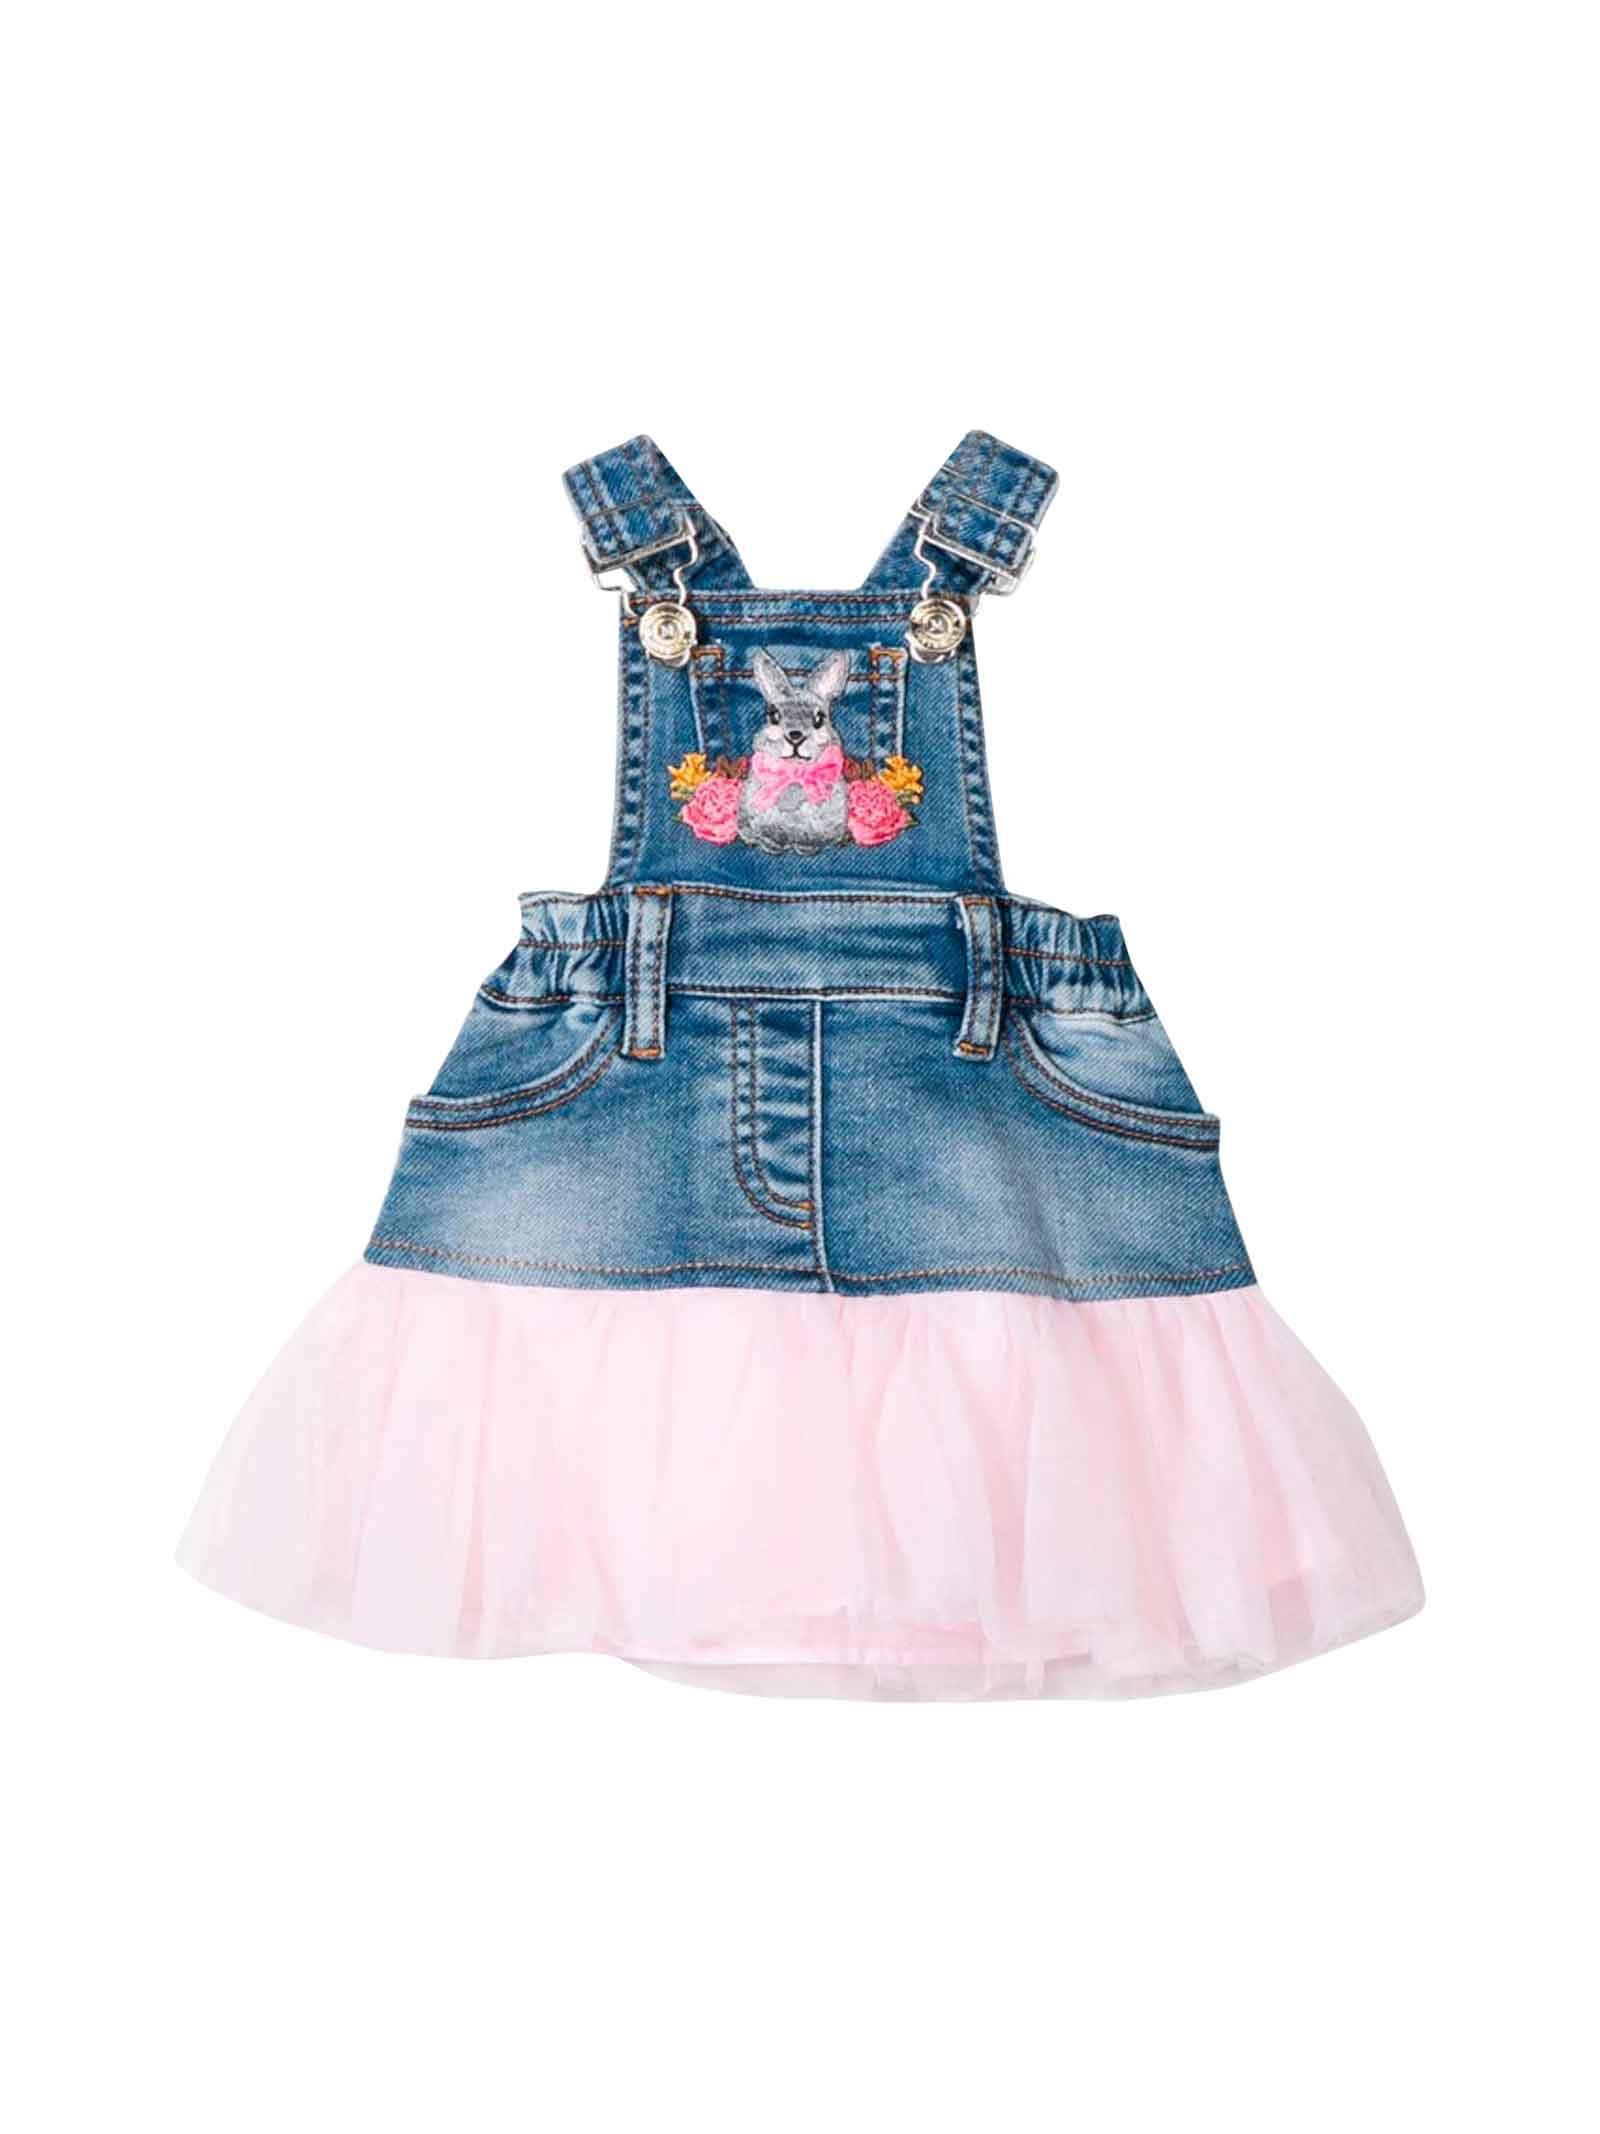 Monnalisa Overalls Dress In Denim